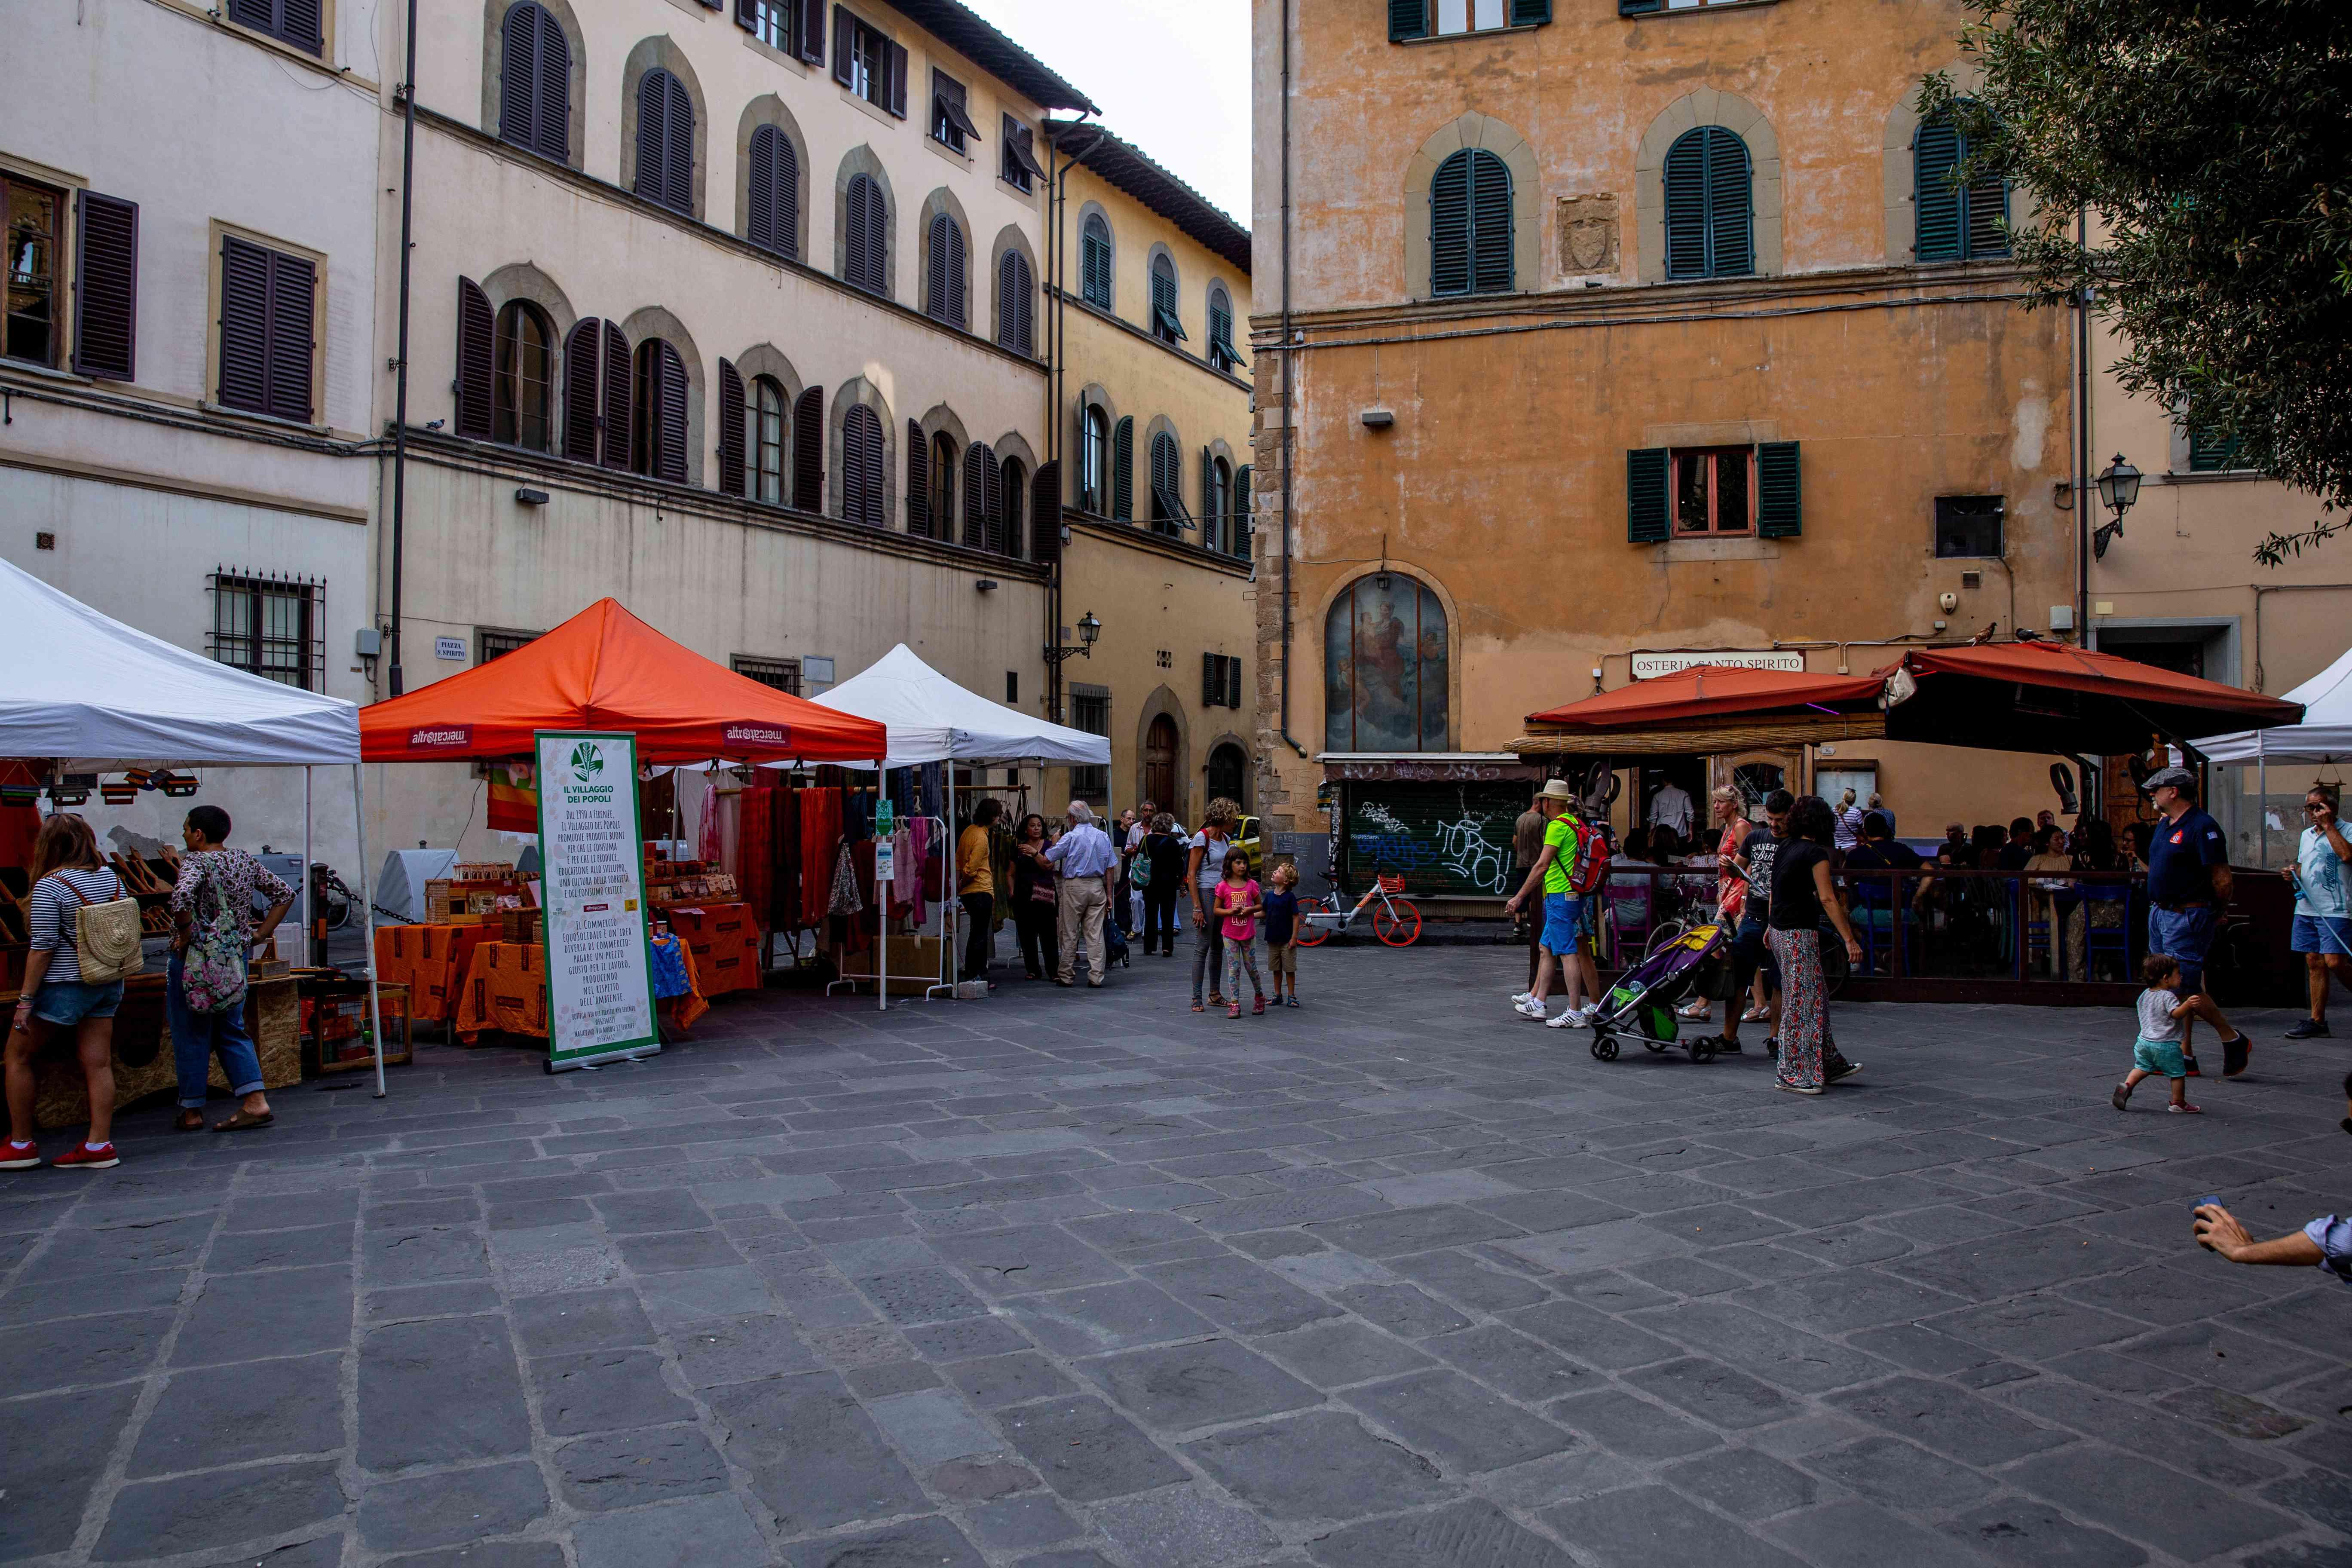 Piazza Santa Spirito in Florence, Italy